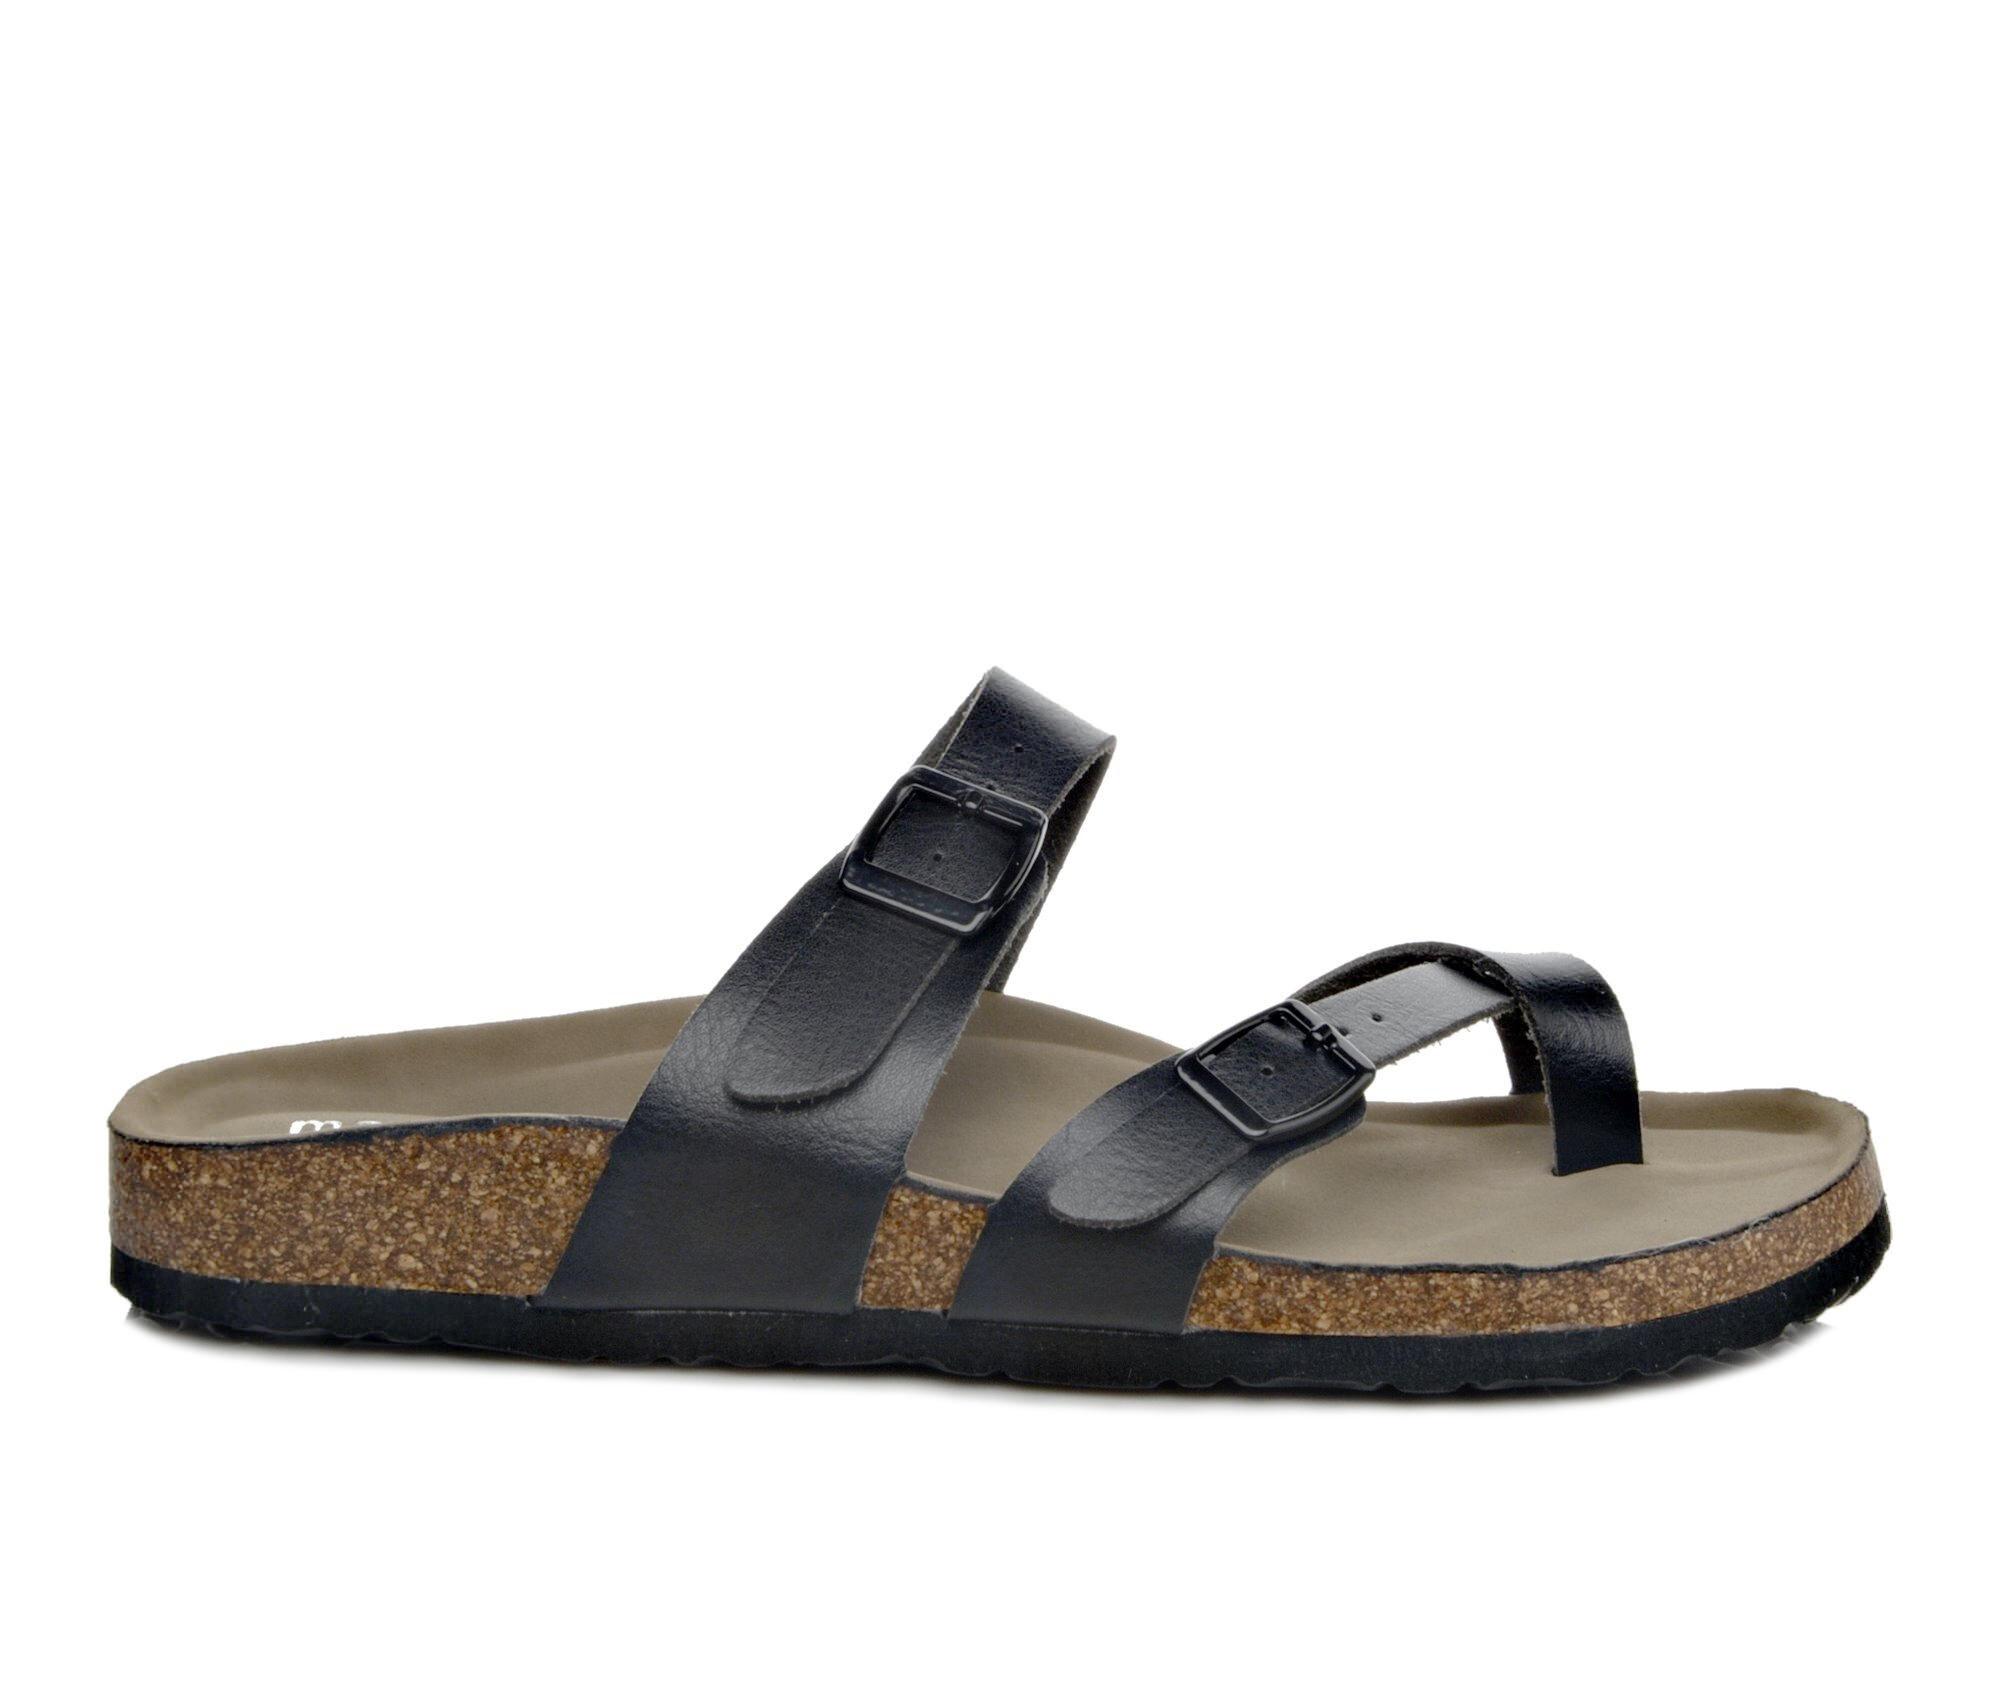 Women's Madden Girl Bryceee Footbed Sandals Black